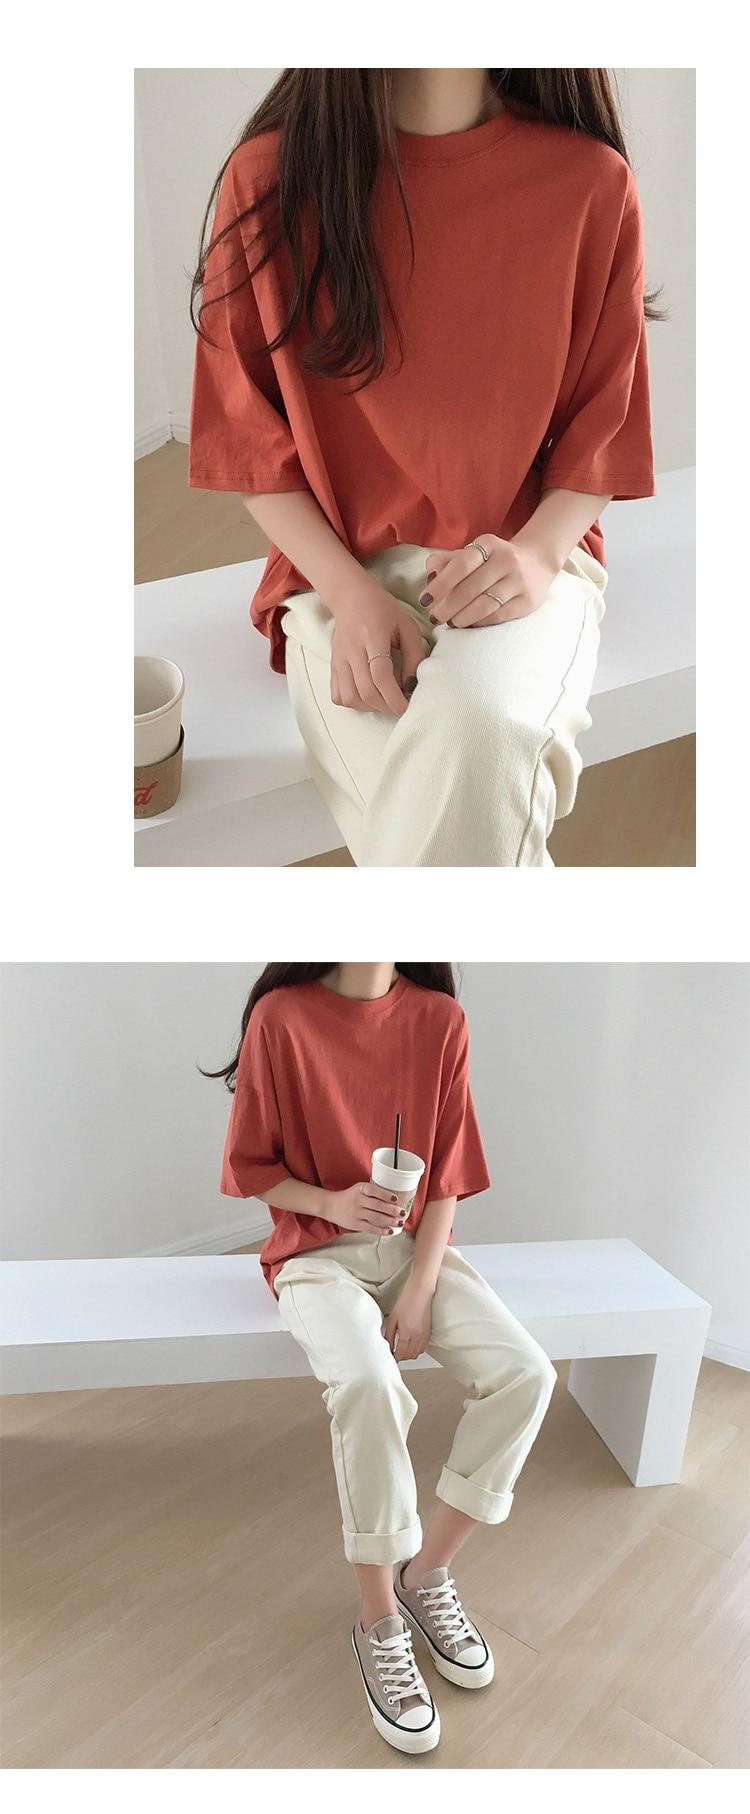 Hdcb85392eba44bf18ee54509b6298cdb0 - Summer O-Neck Short Sleeves Minimalist Loose Basic T-Shirt